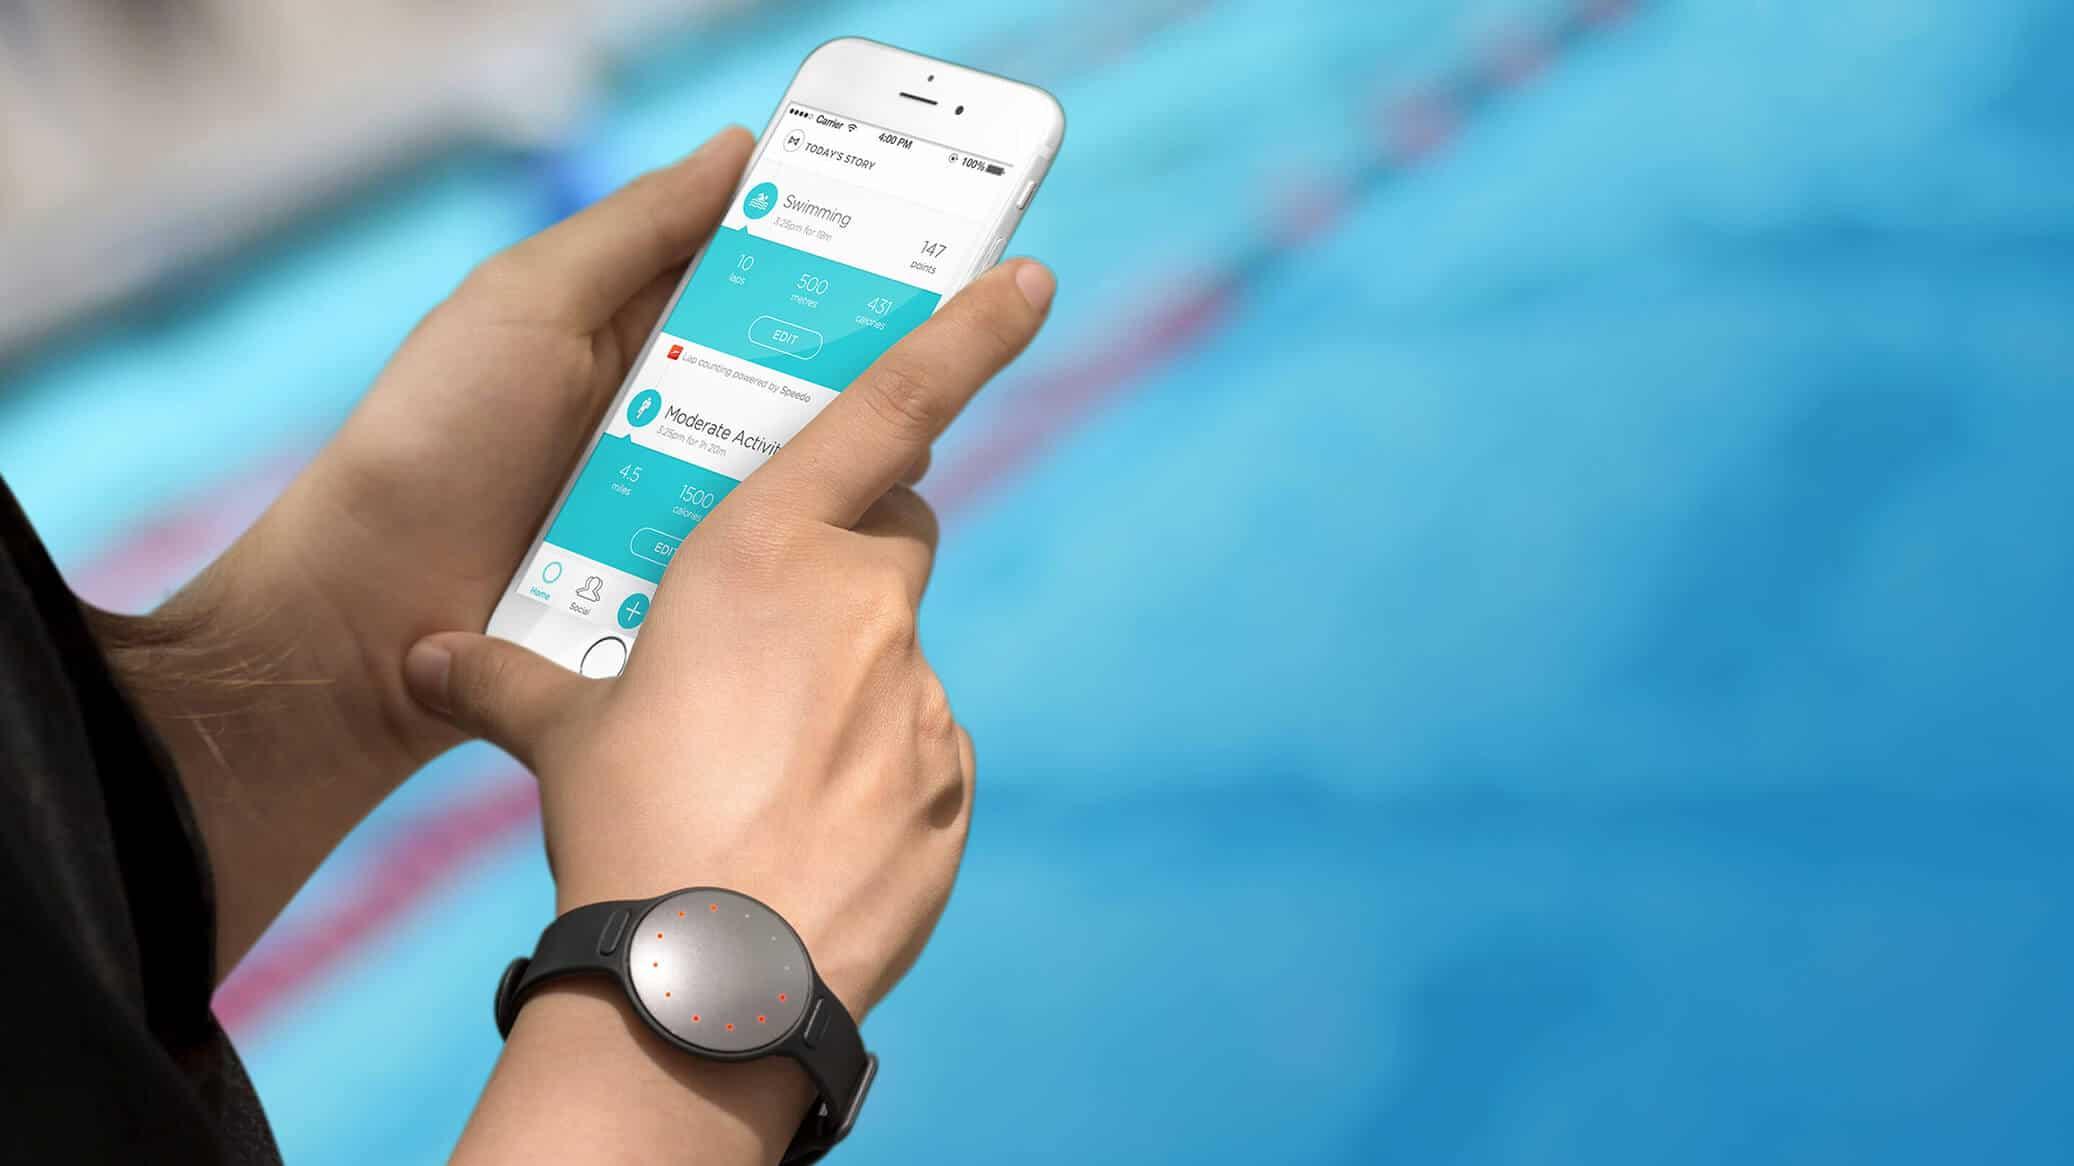 misfit makes a splash with new swim tracker 2 - Misfit makes a splash with new swim tracker